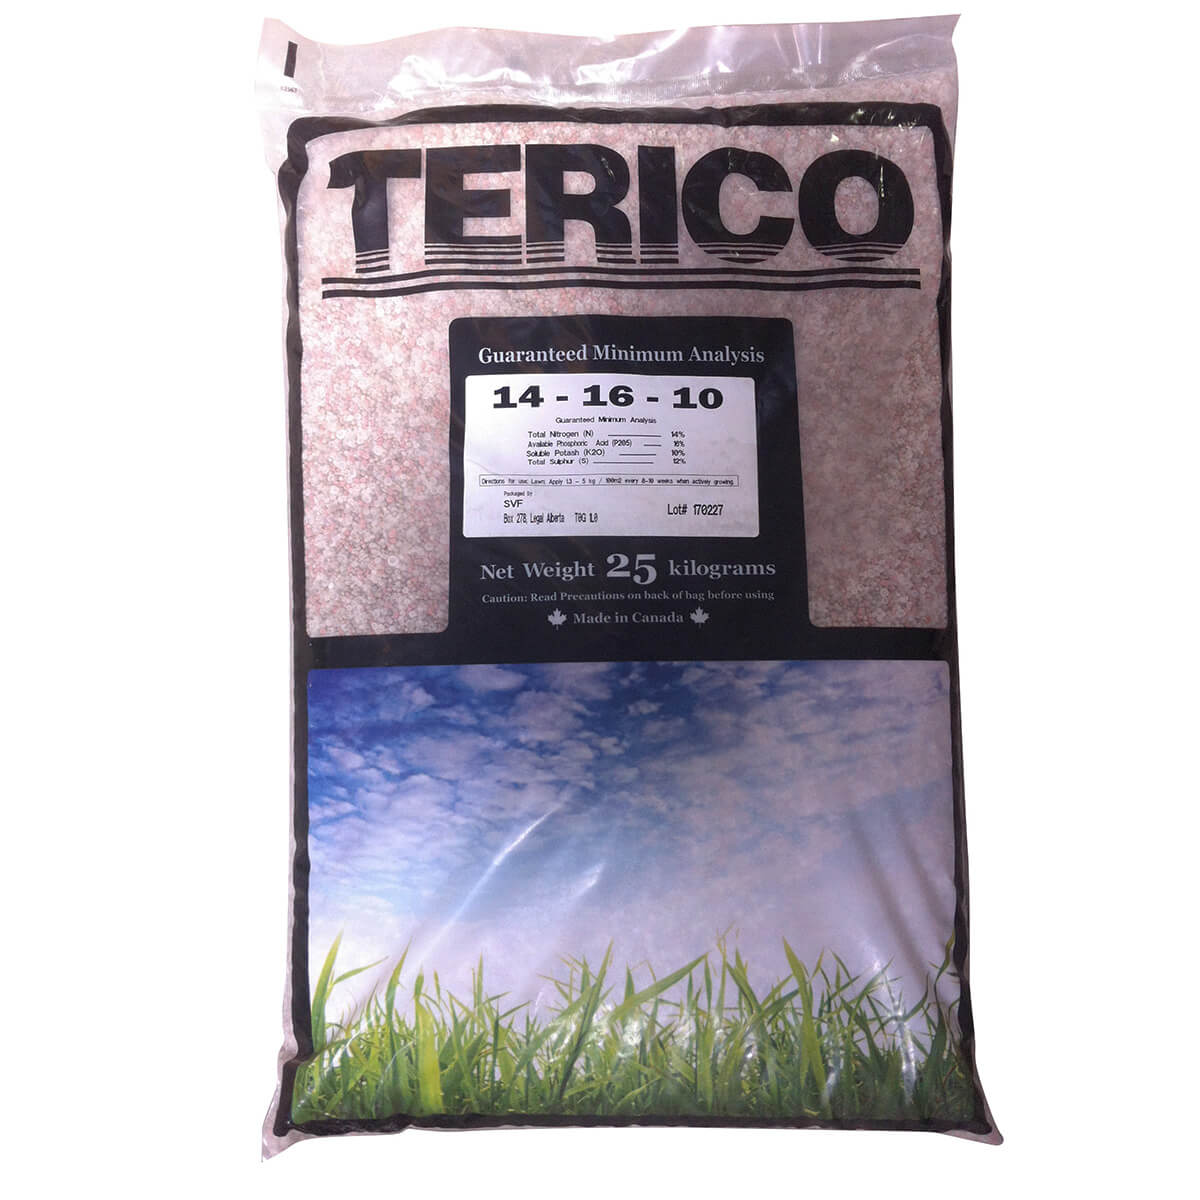 14-16-10 Terico Fall Lawn Fertilizer 25 kg